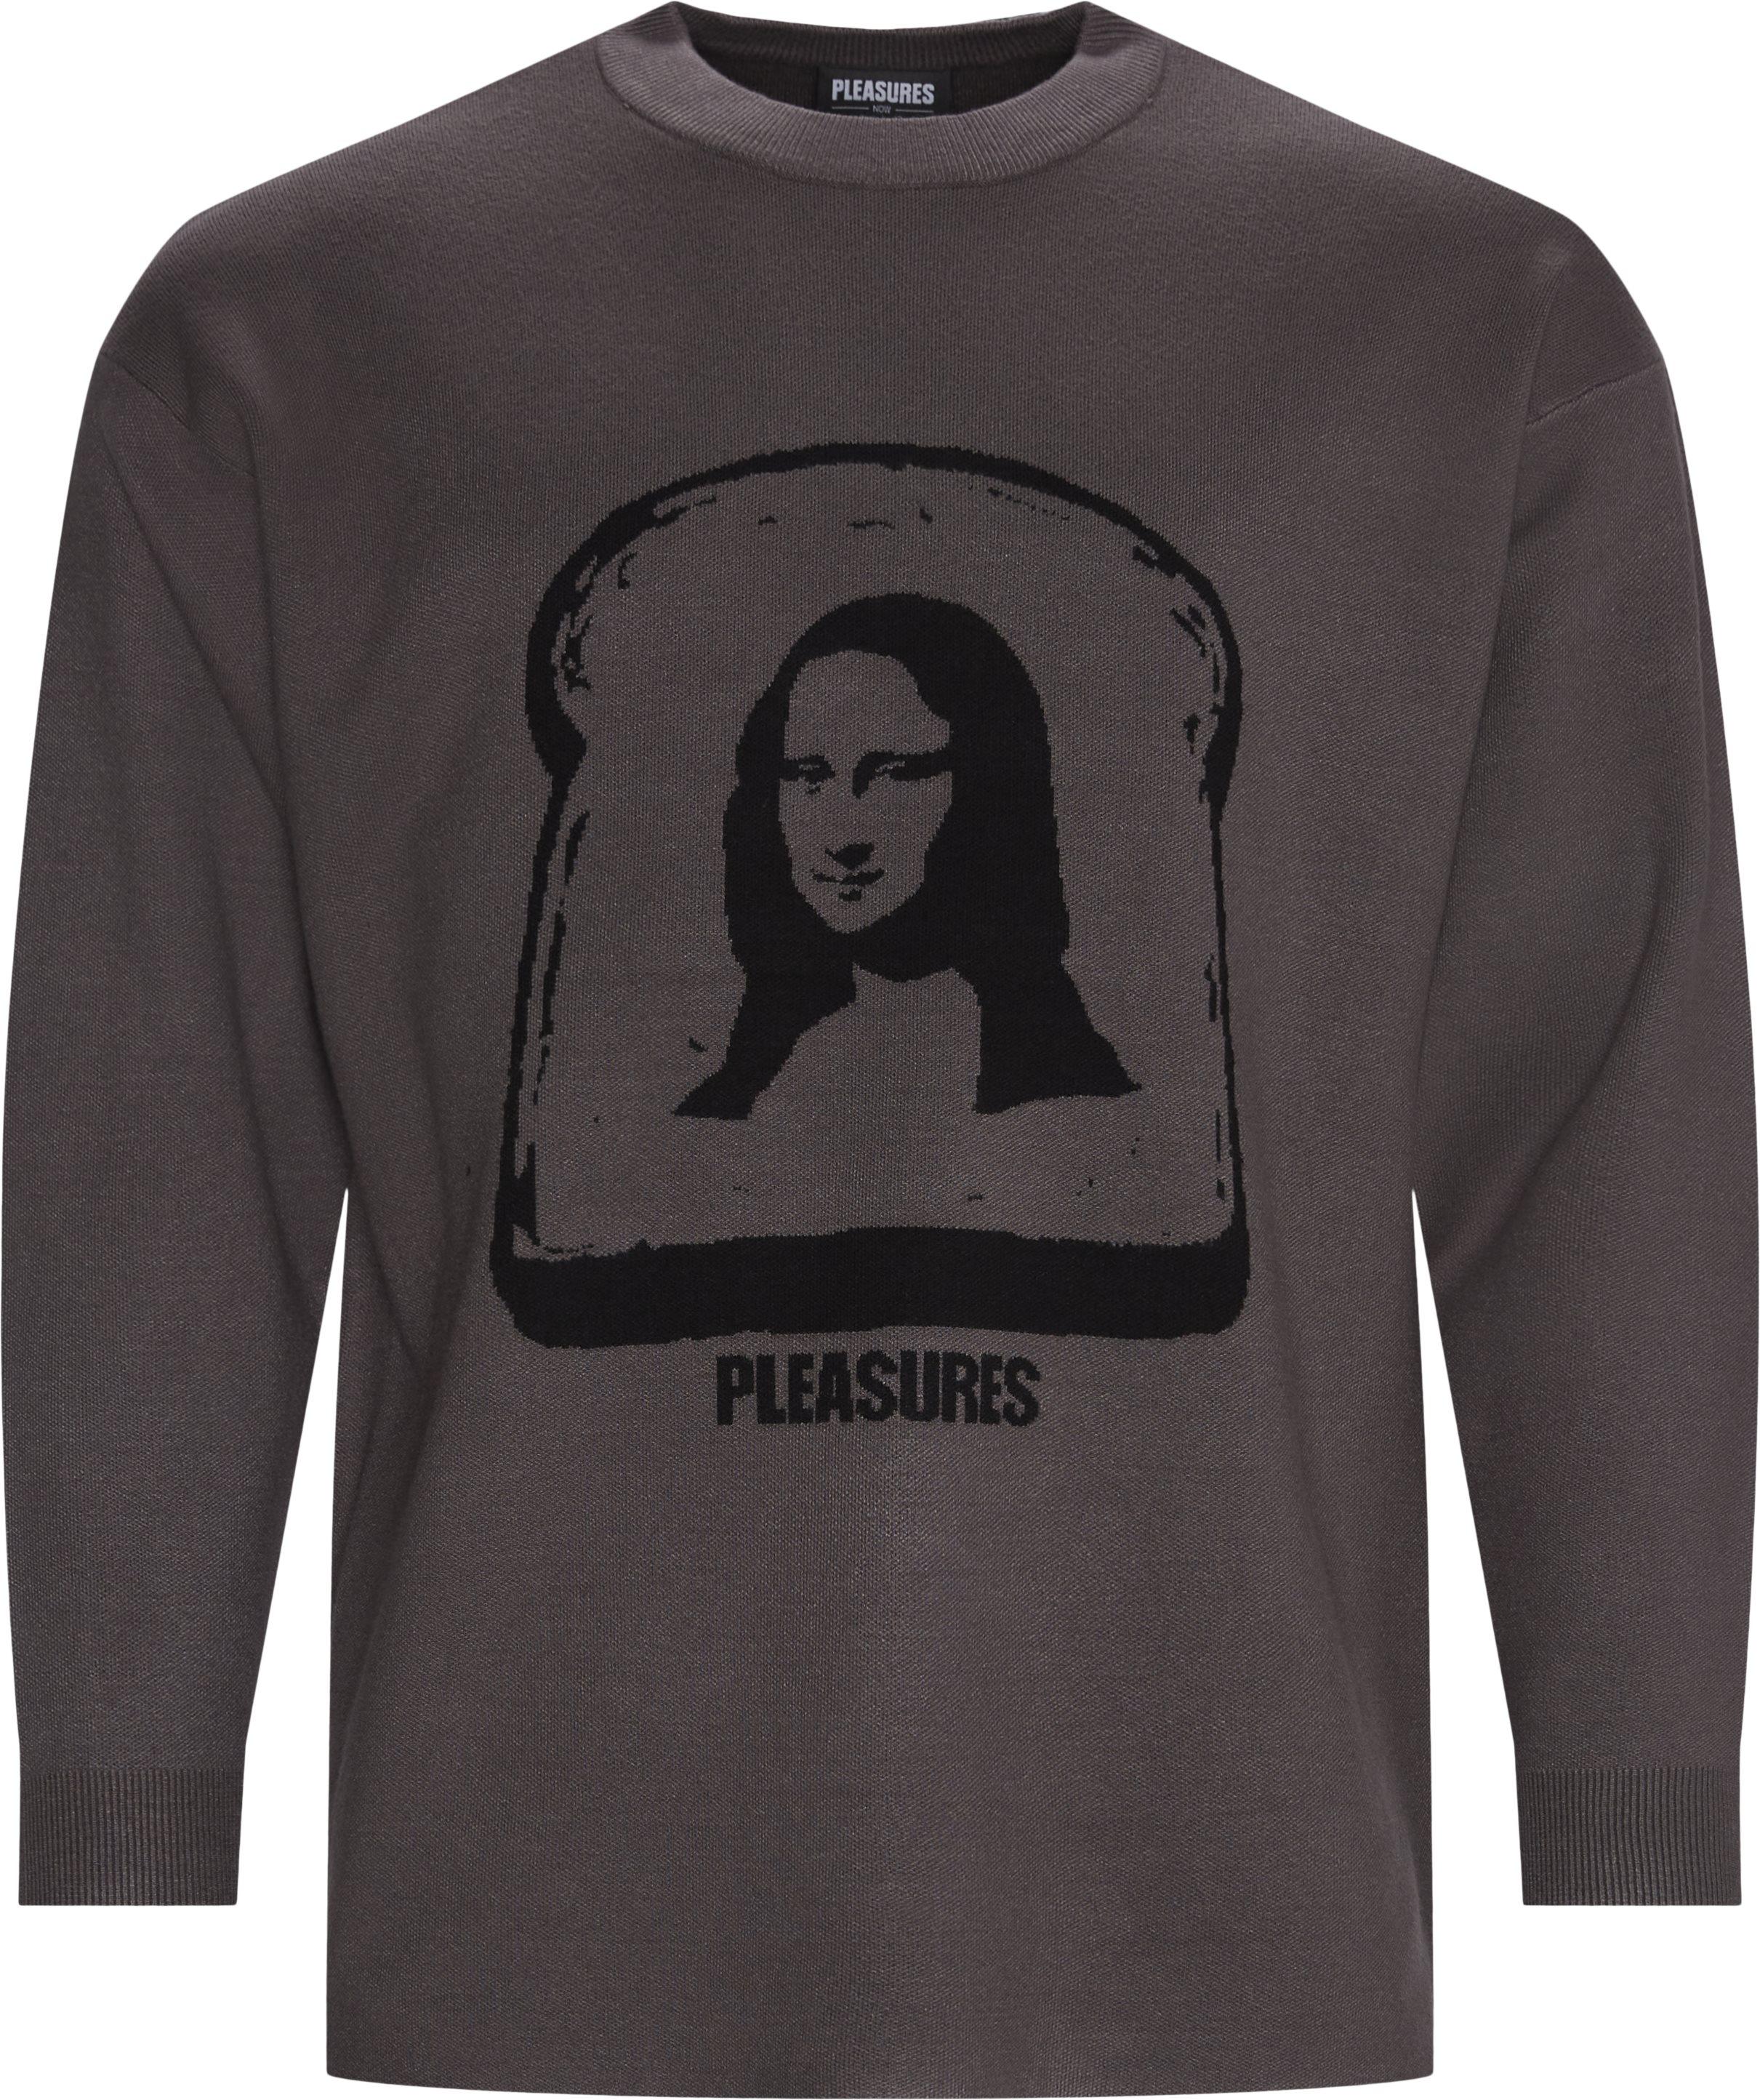 Mona Knit Crewneck Sweatshirt - Sweatshirts - Regular - Grå